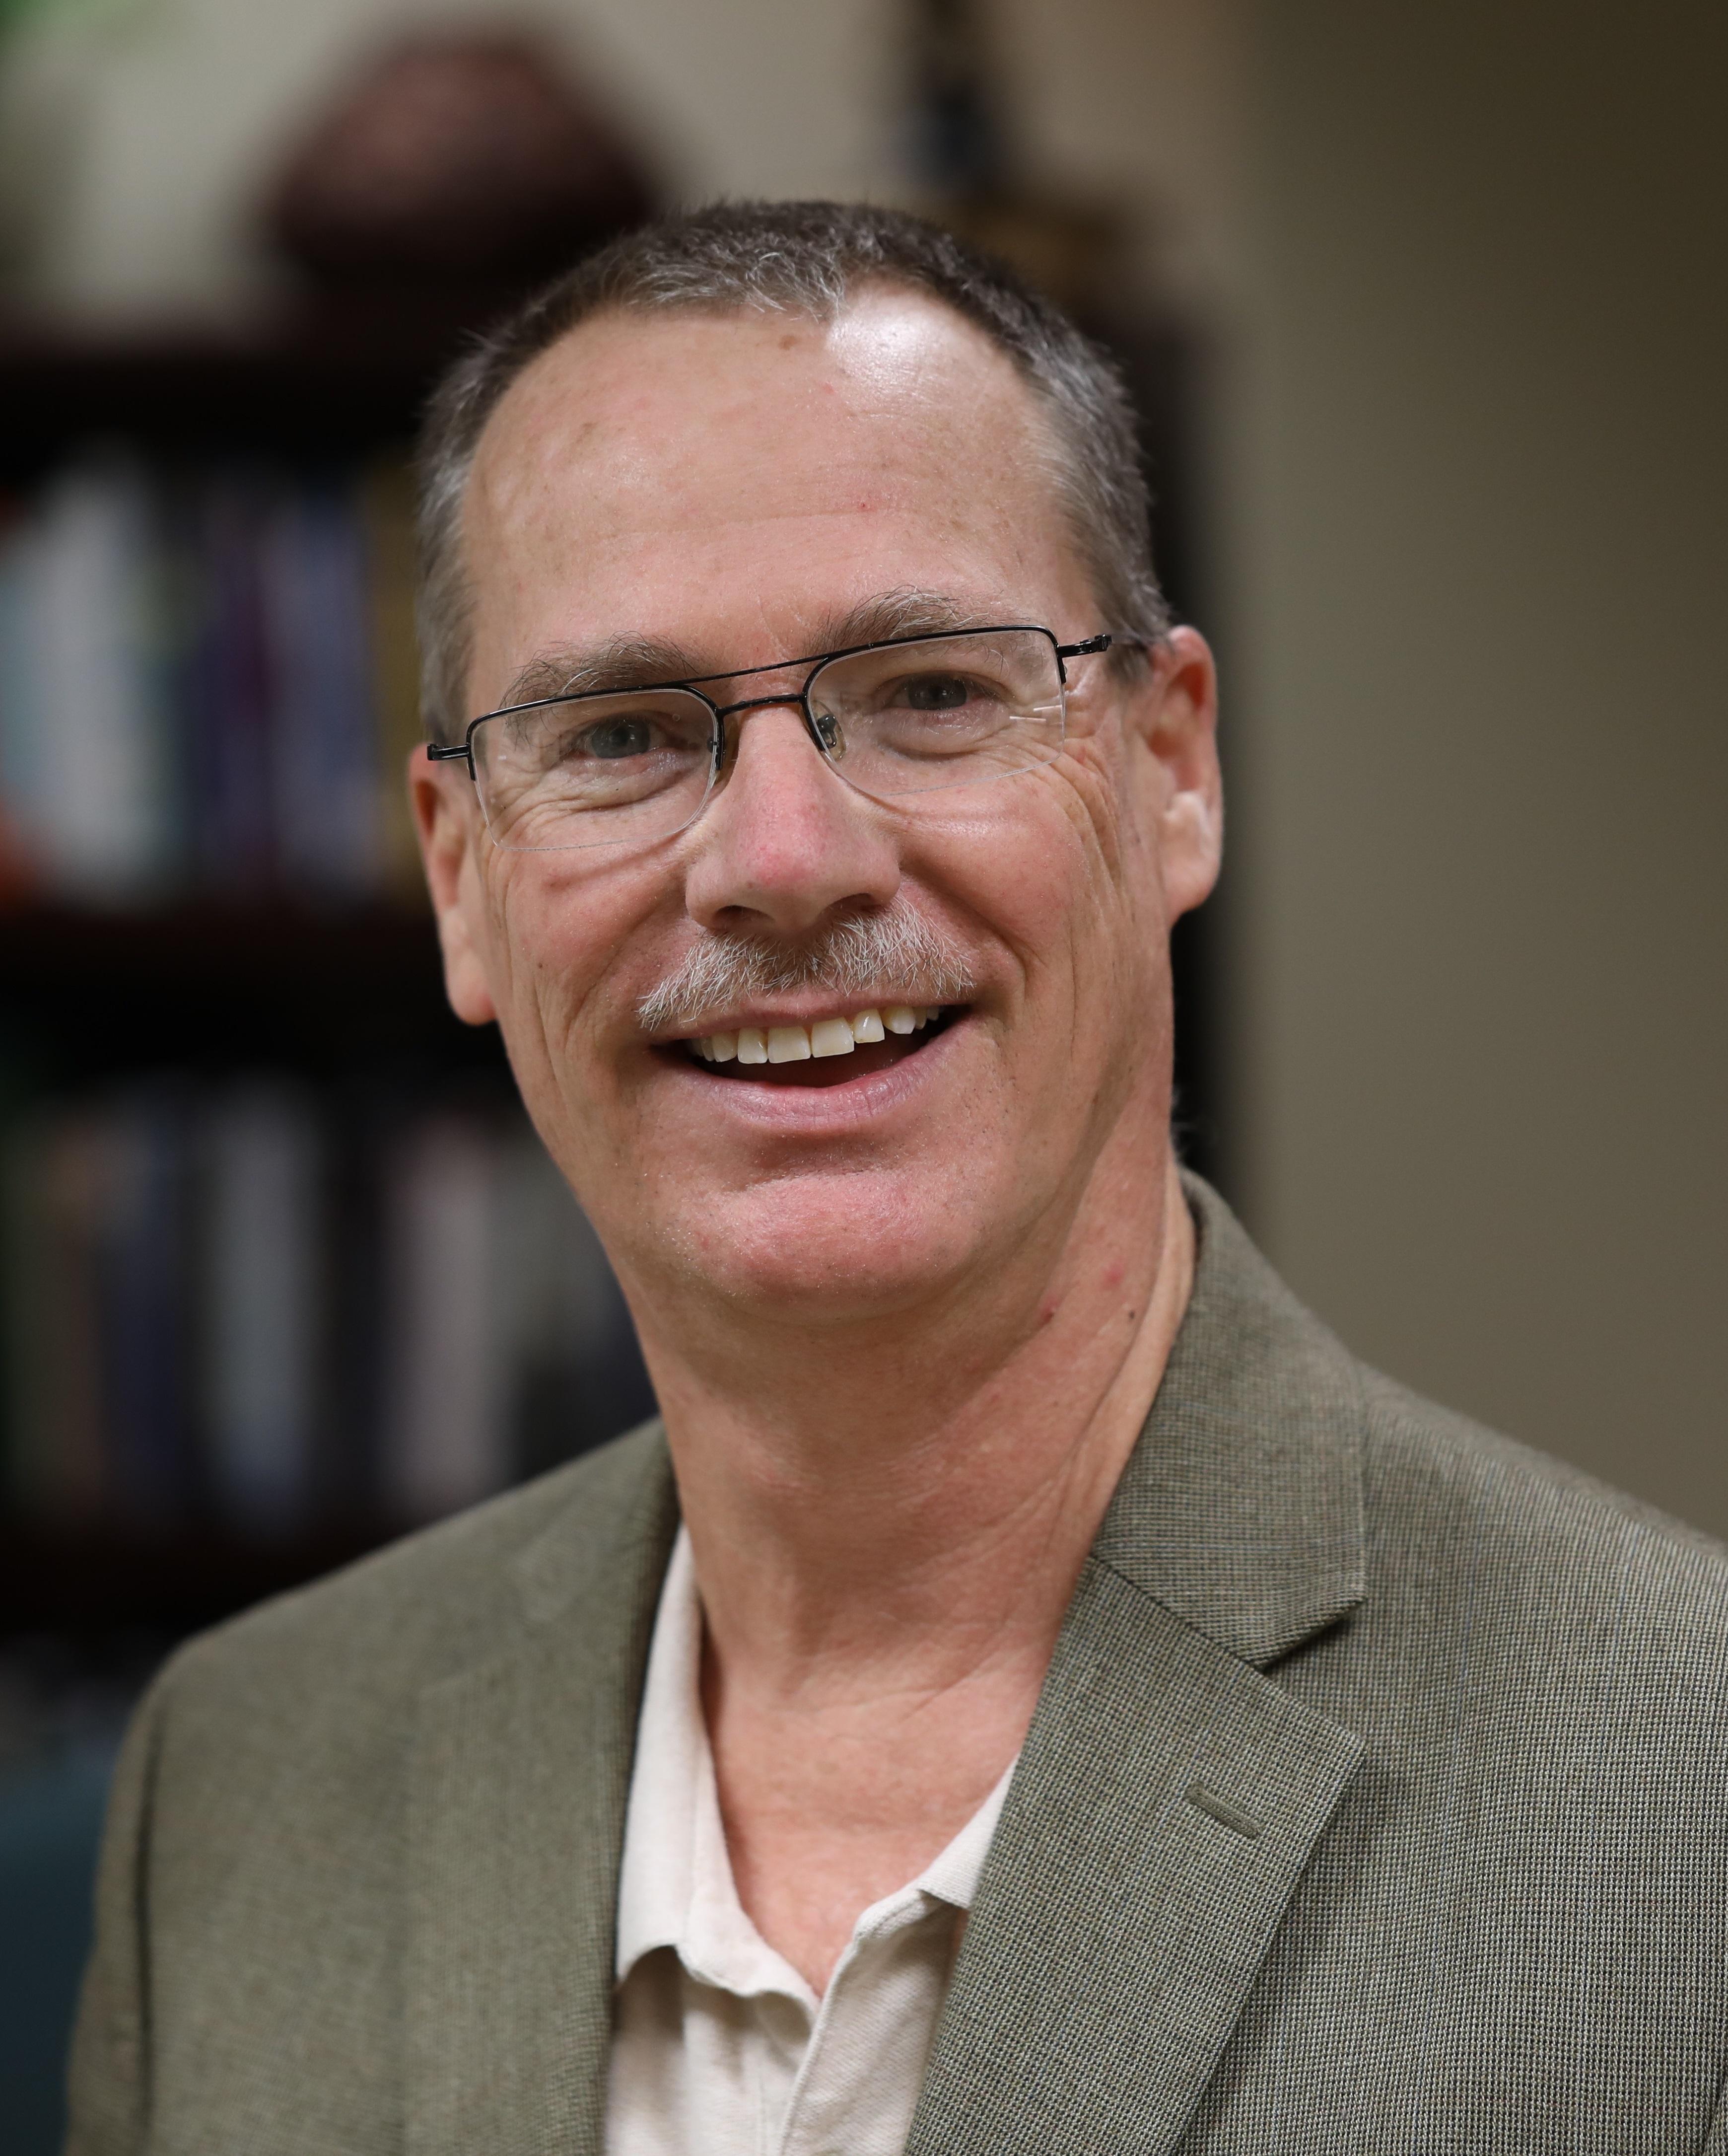 William G. Hoy, DMin, FT